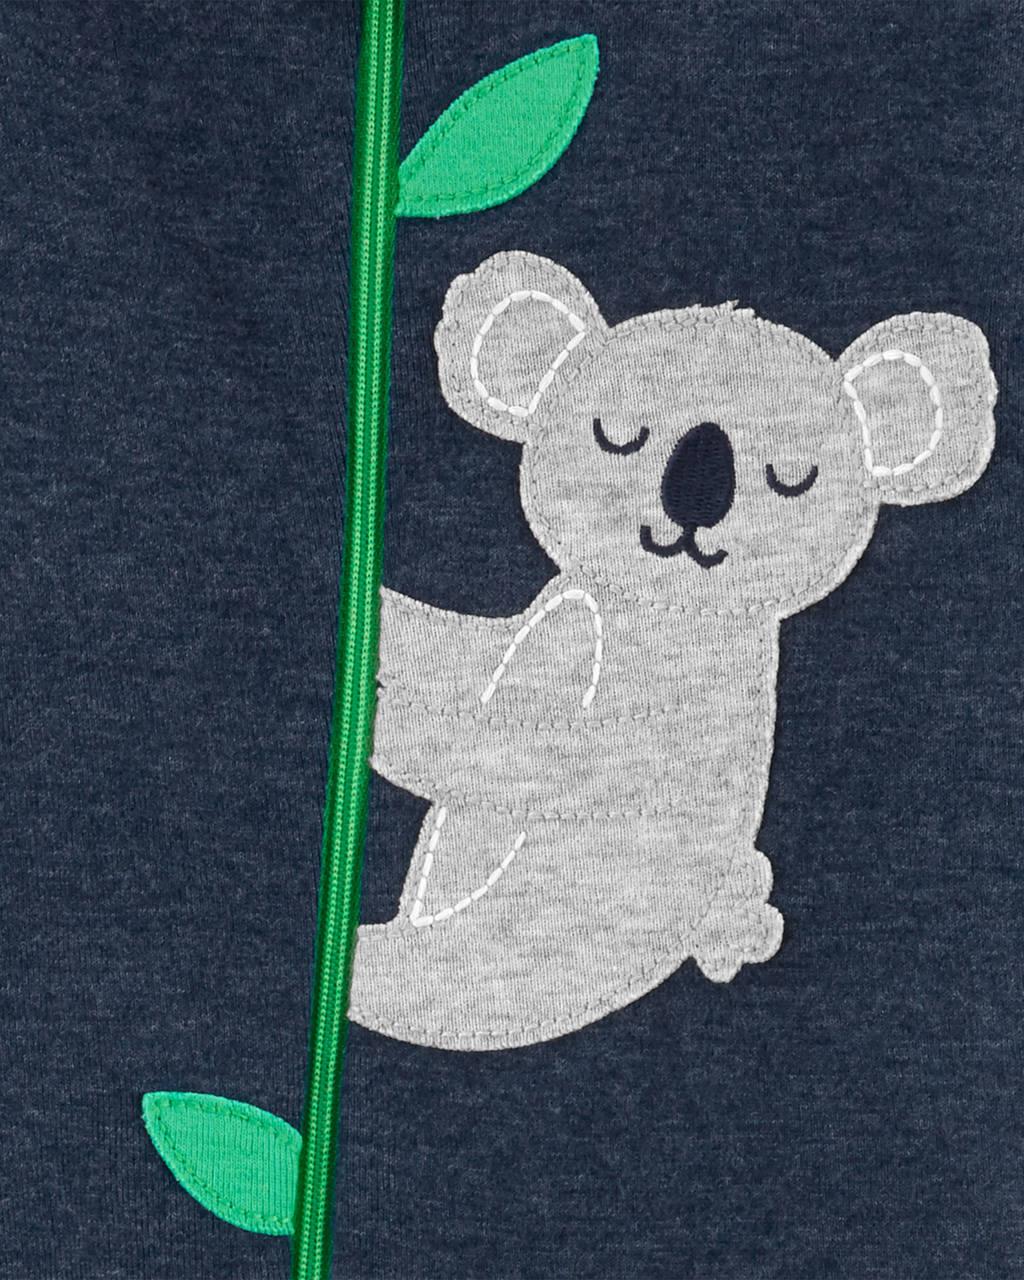 Pijama Koala Boy Carter's